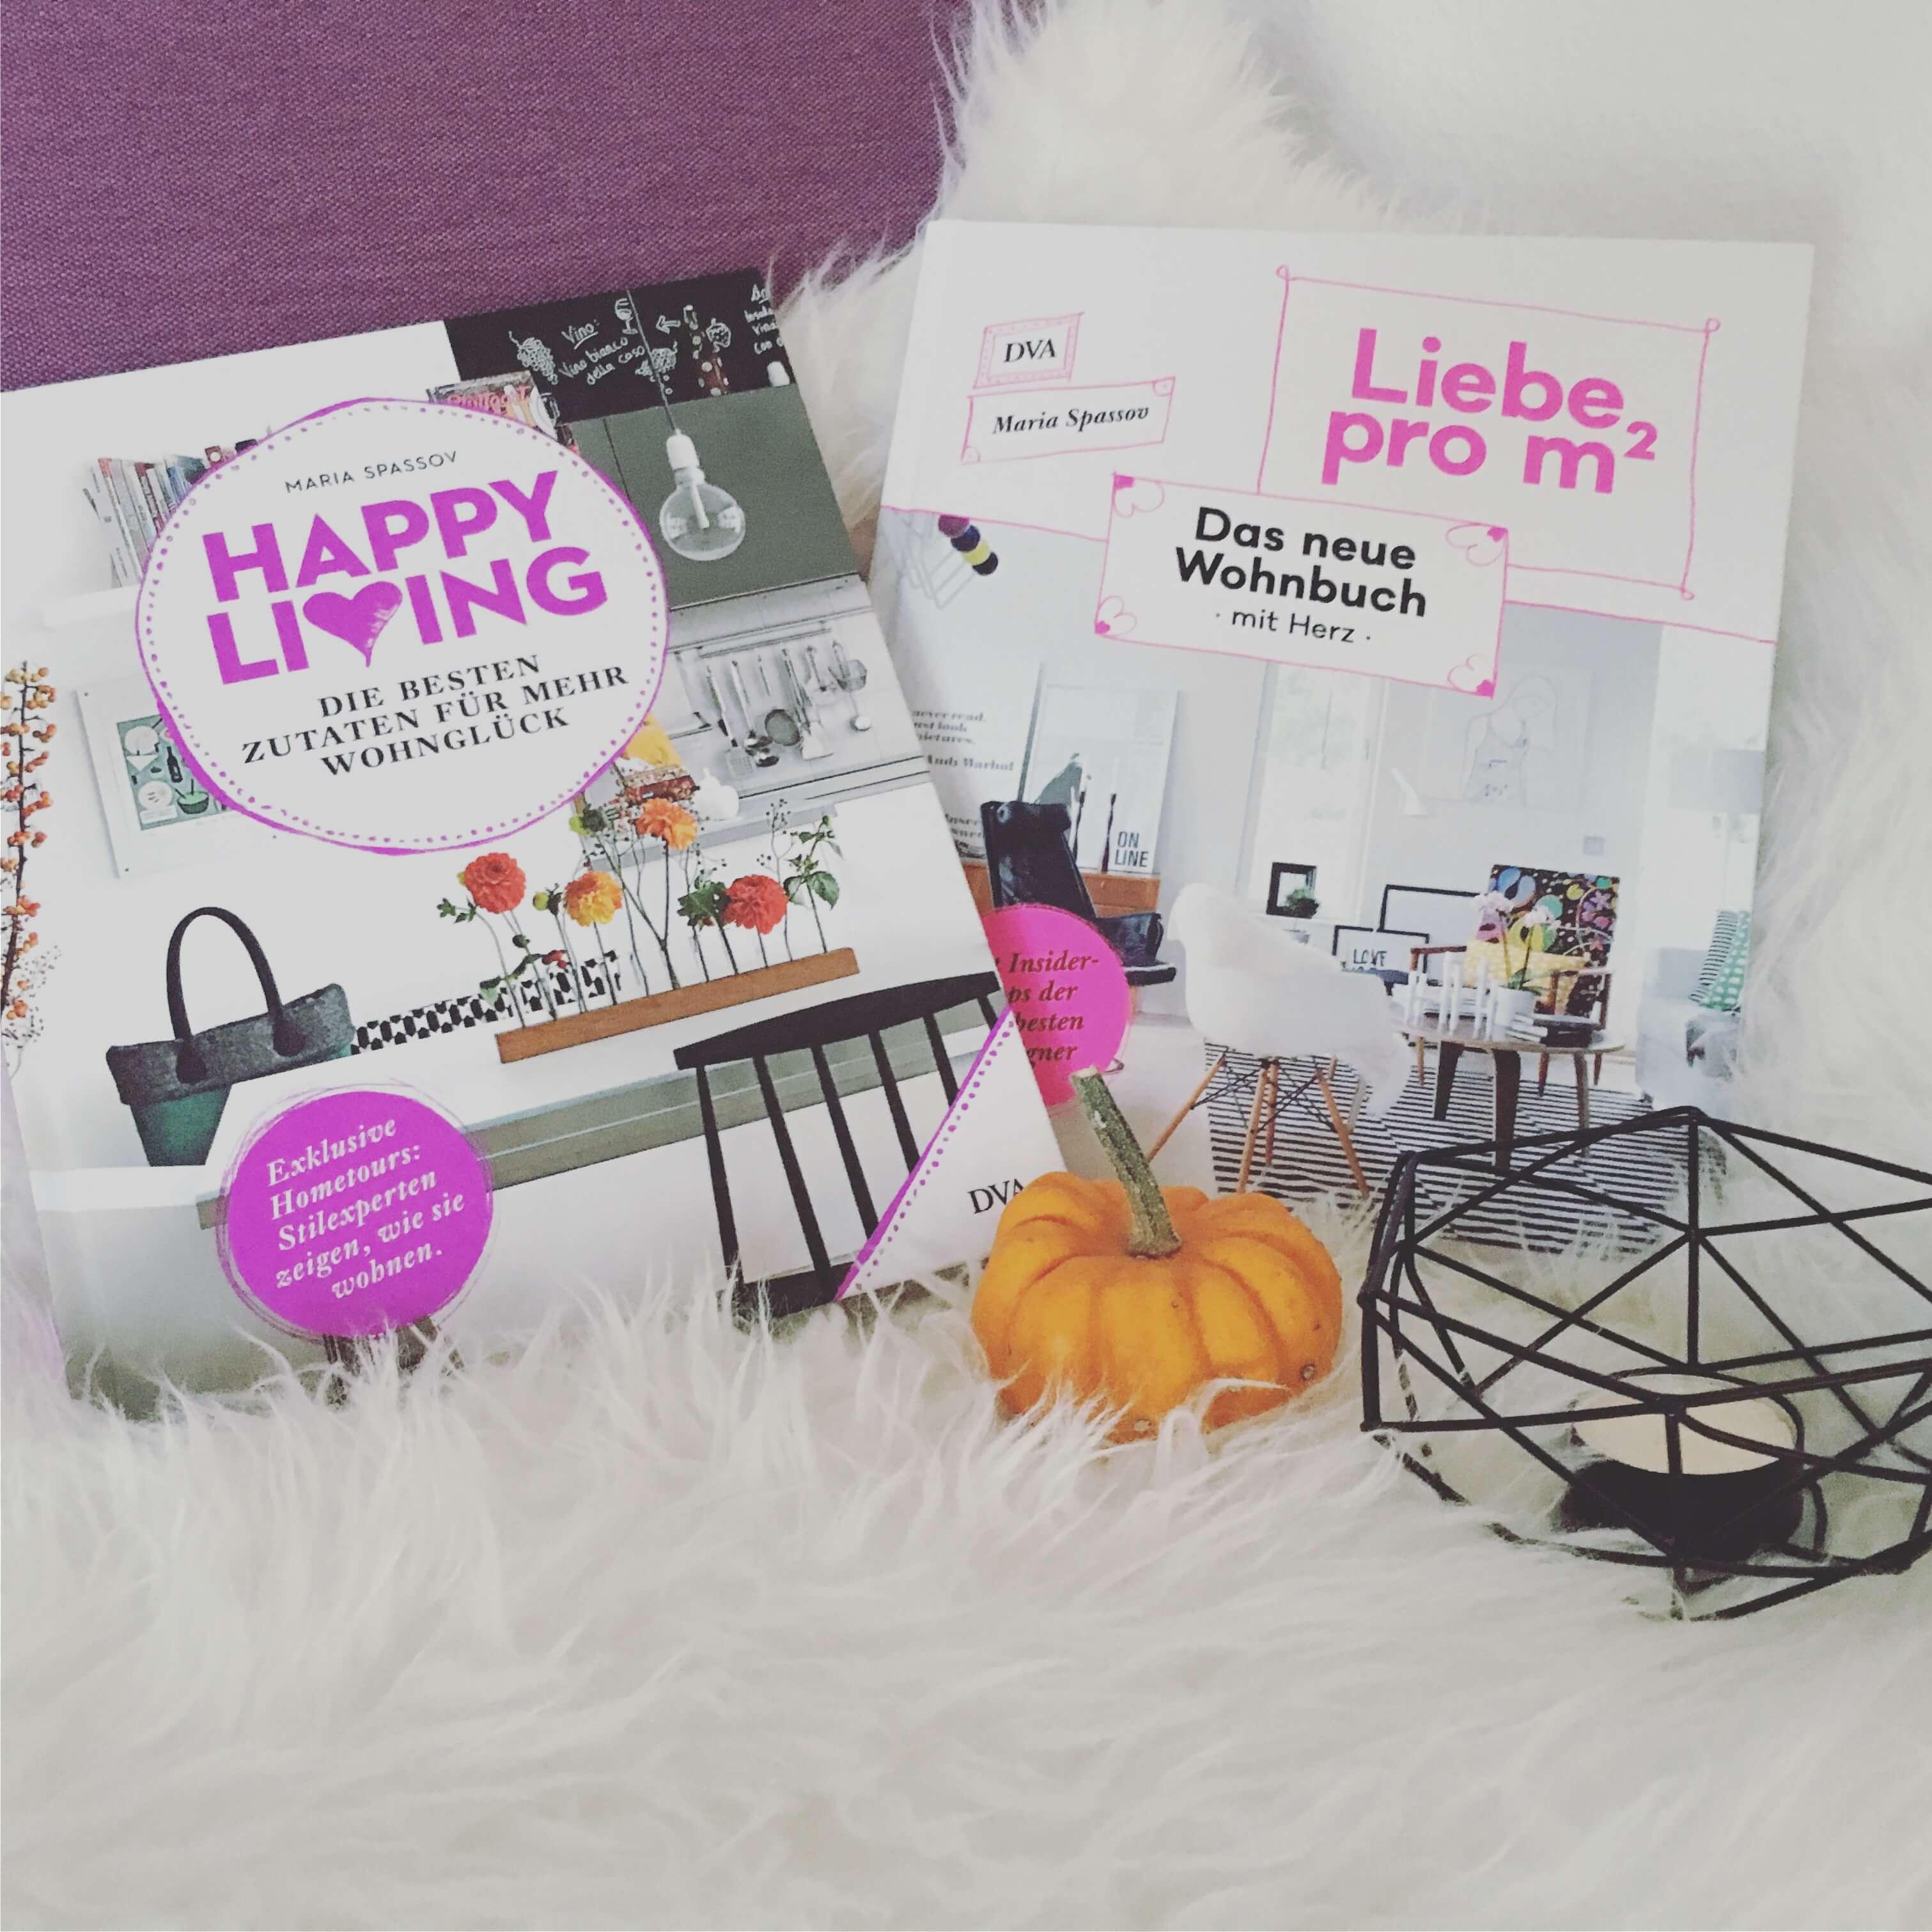 happy_living_liebe_pro_qm